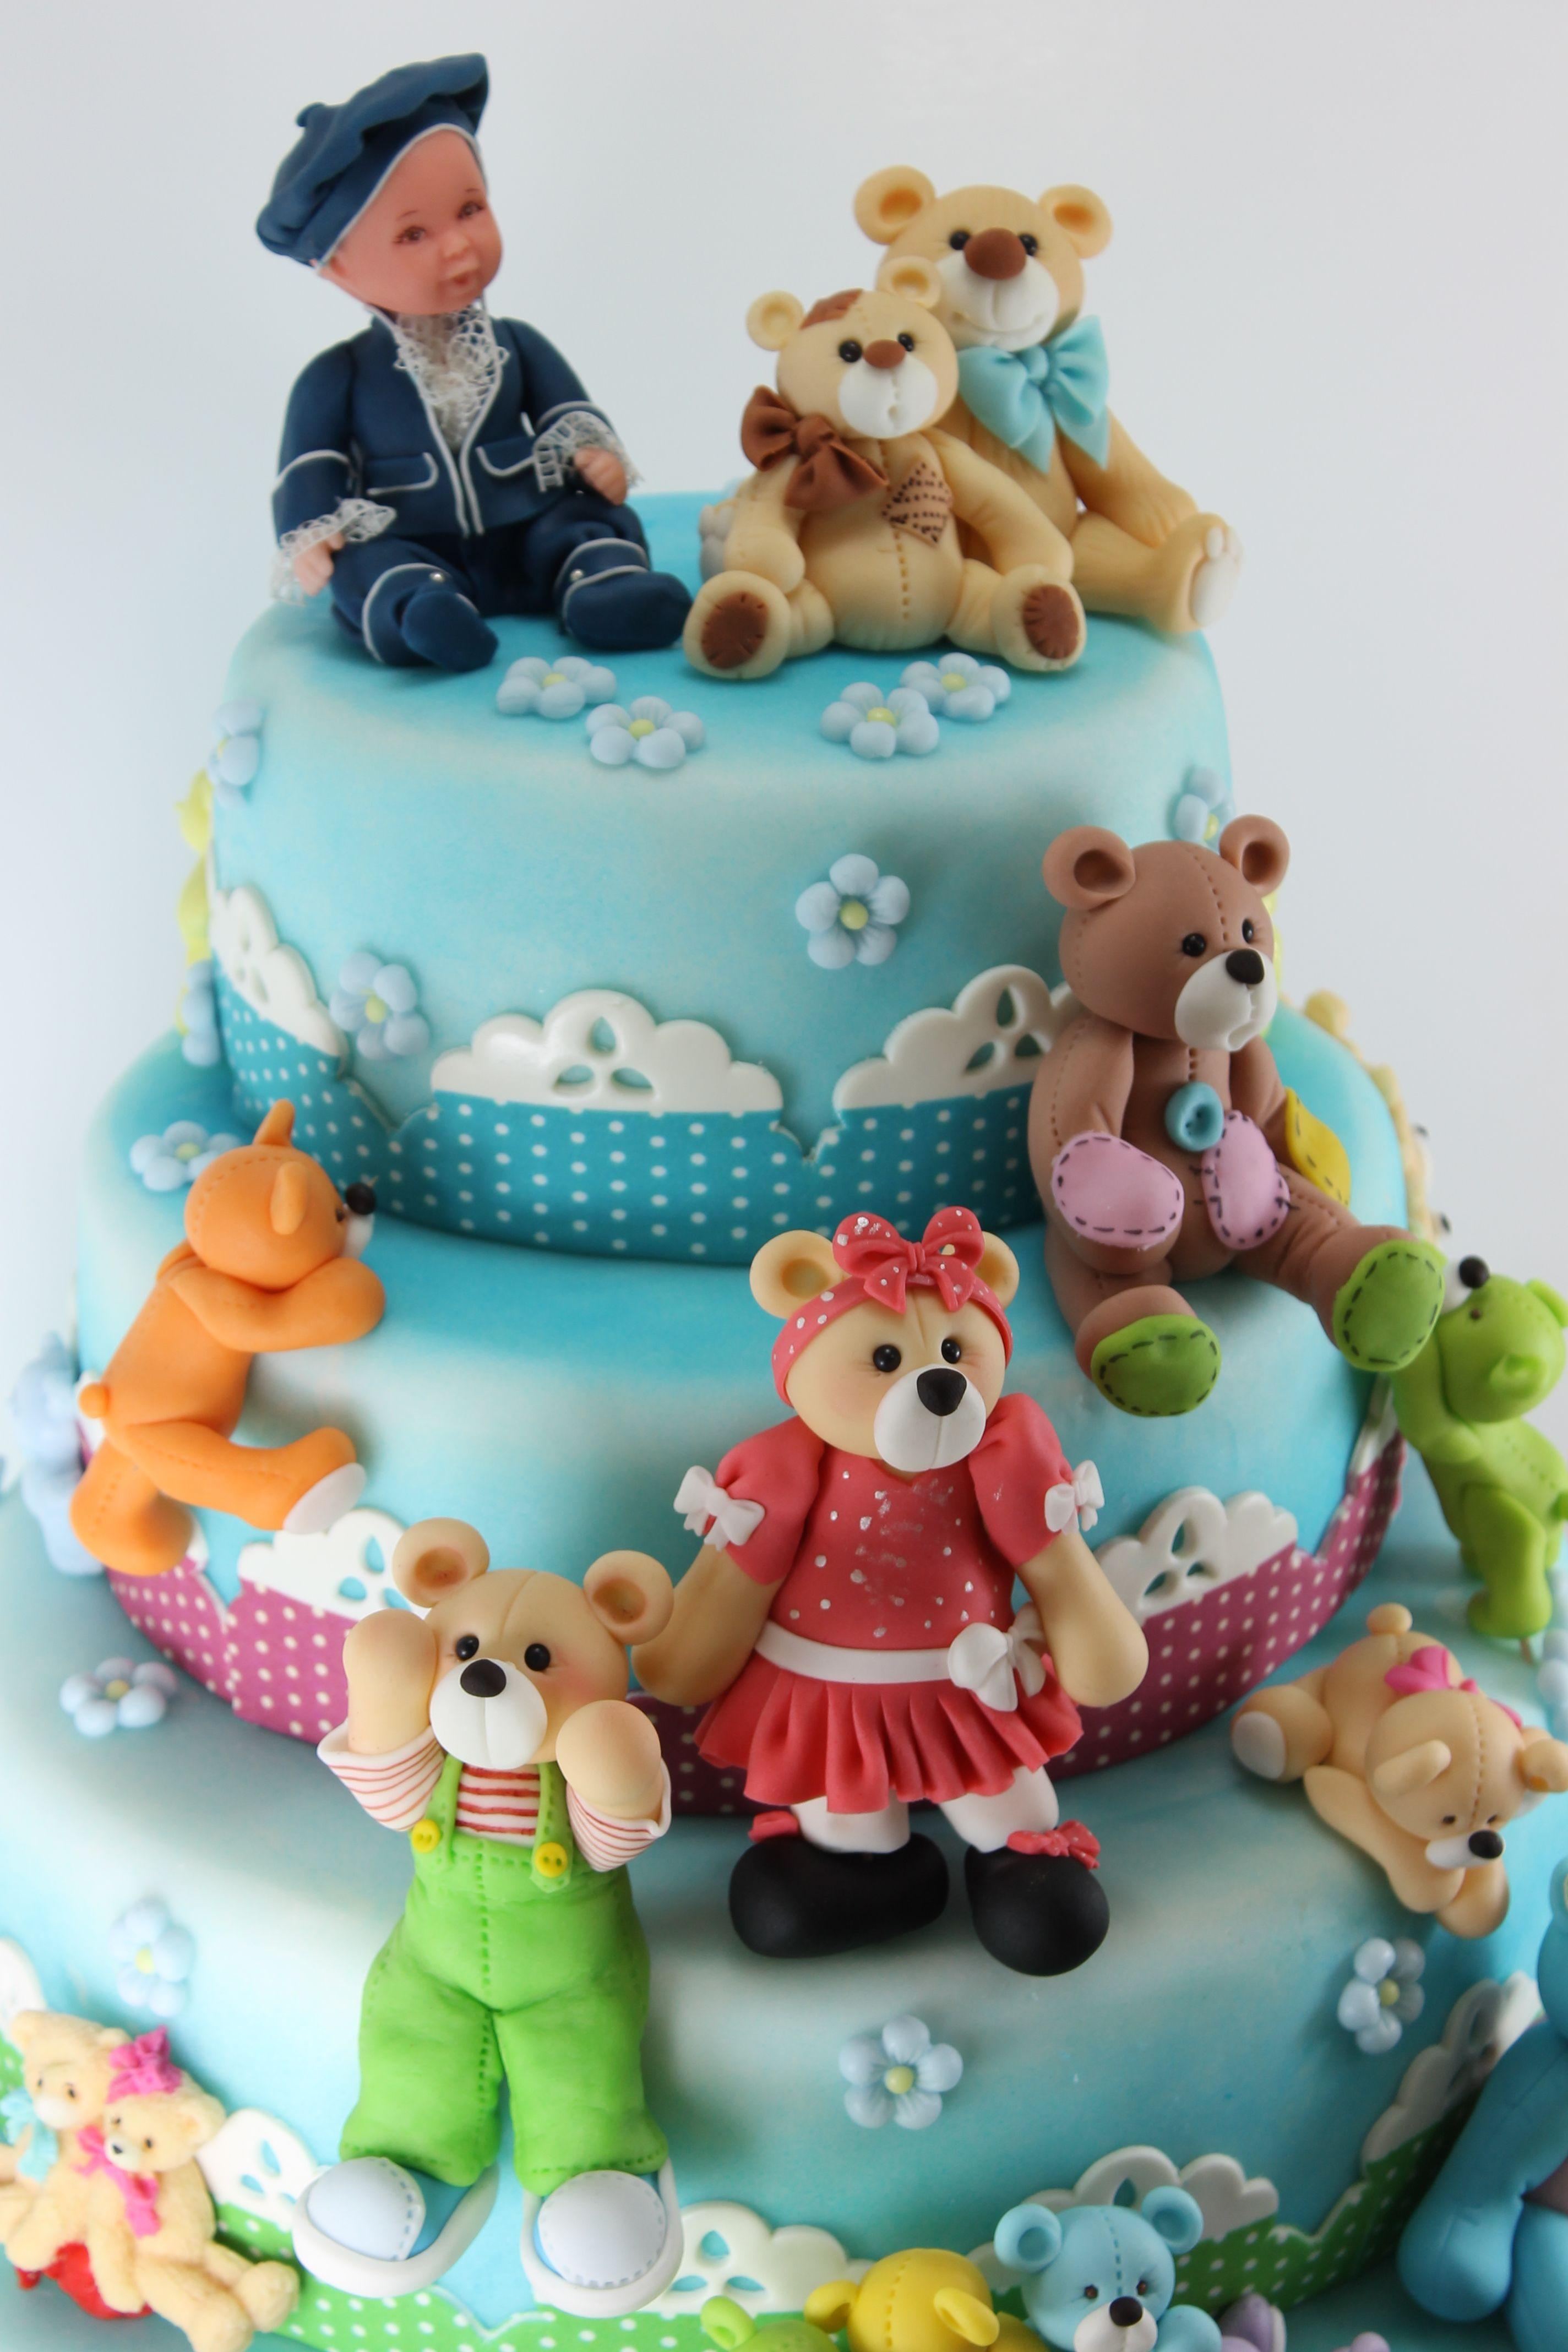 Cute Baby Amp Amp Teddy Bear Cake